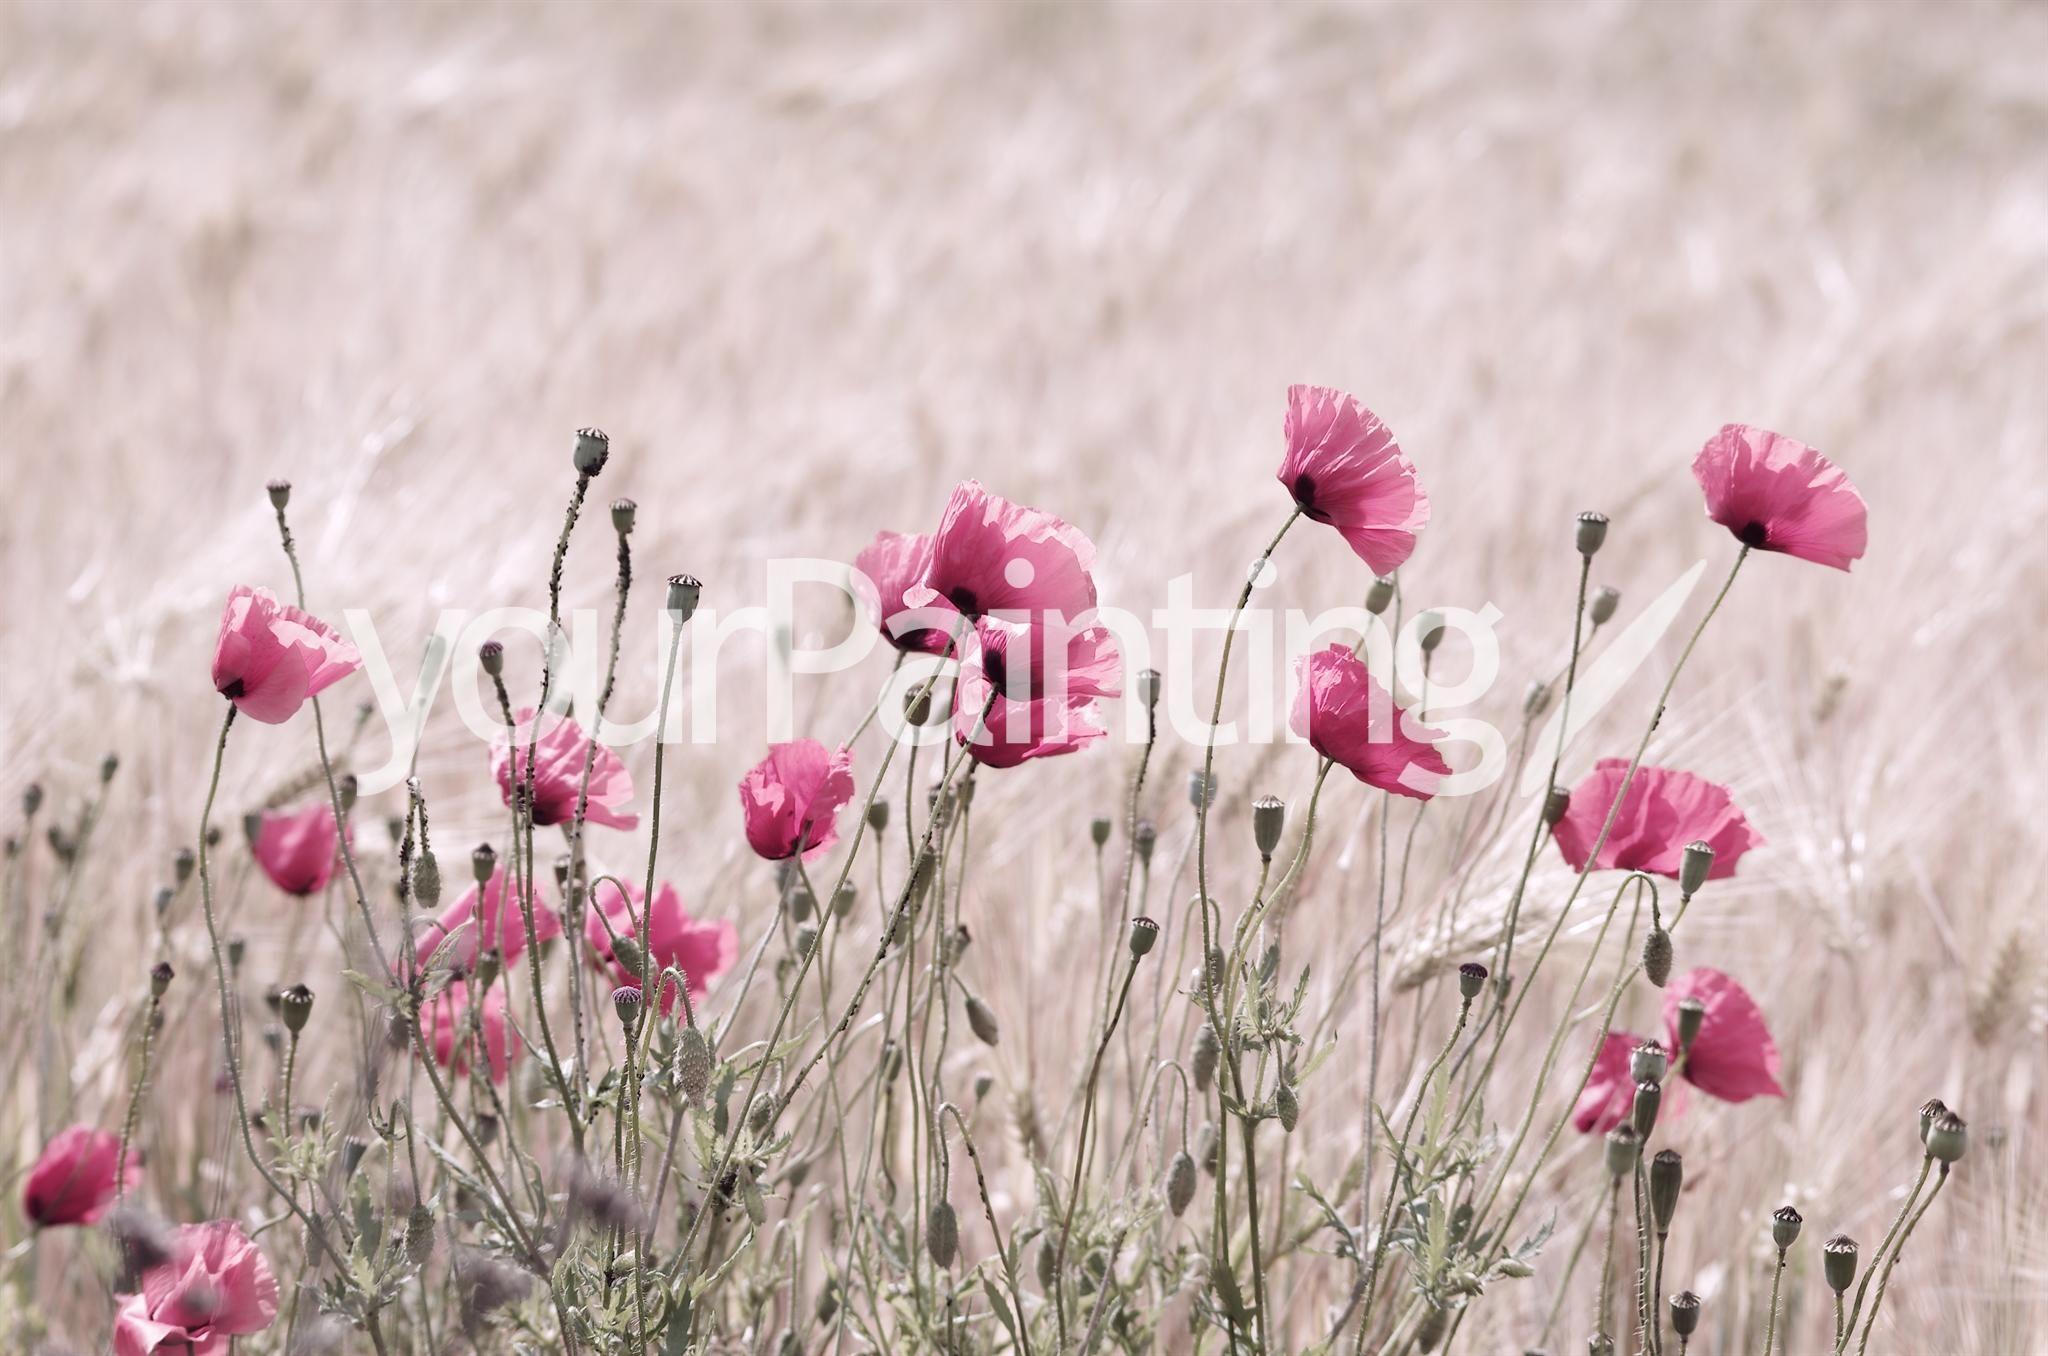 foto mohnblumen rosa - Google-Suche